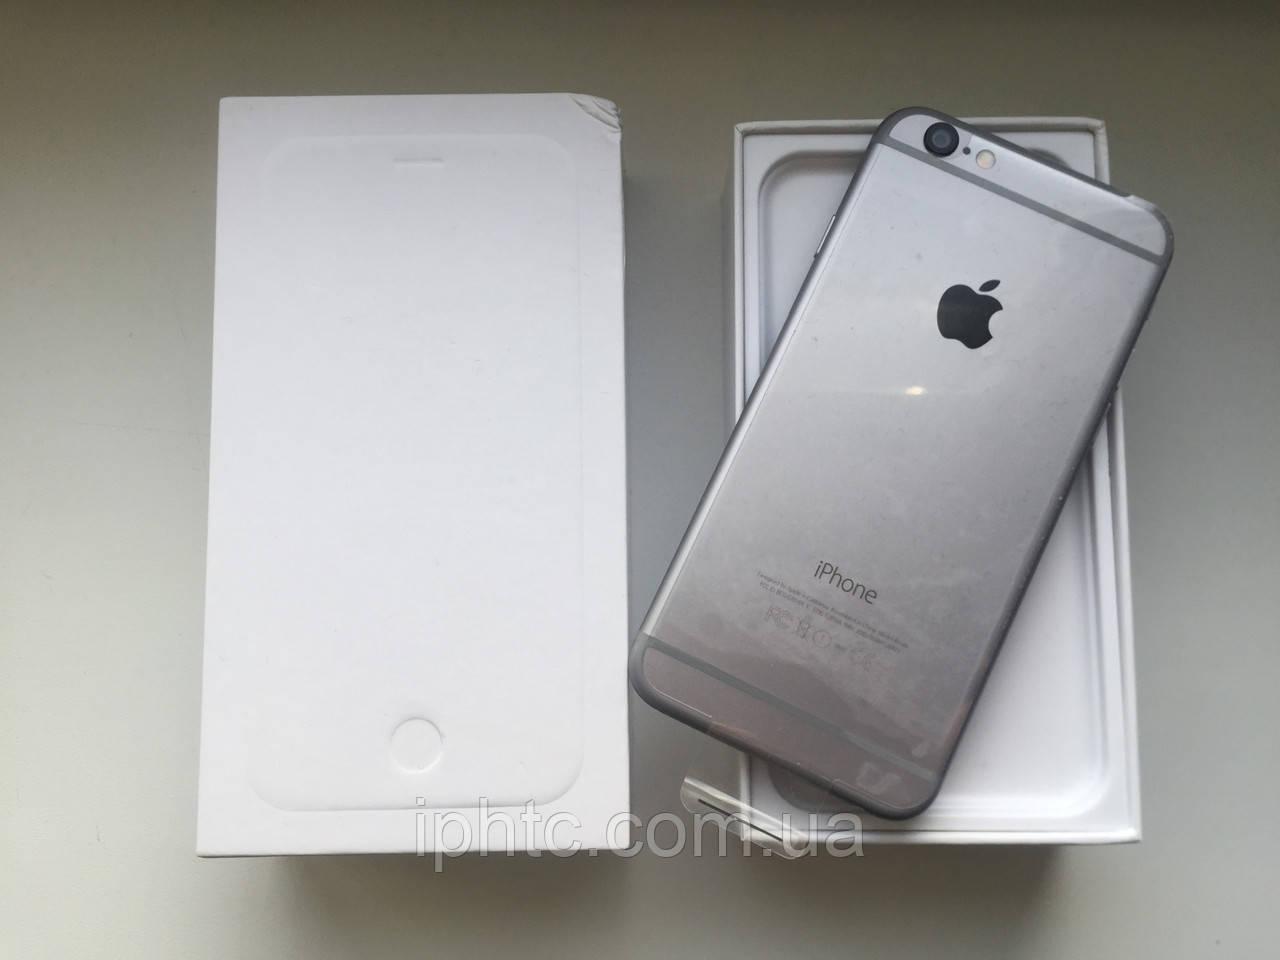 Apple Iphone 6 64gb Space Grey Neverlock